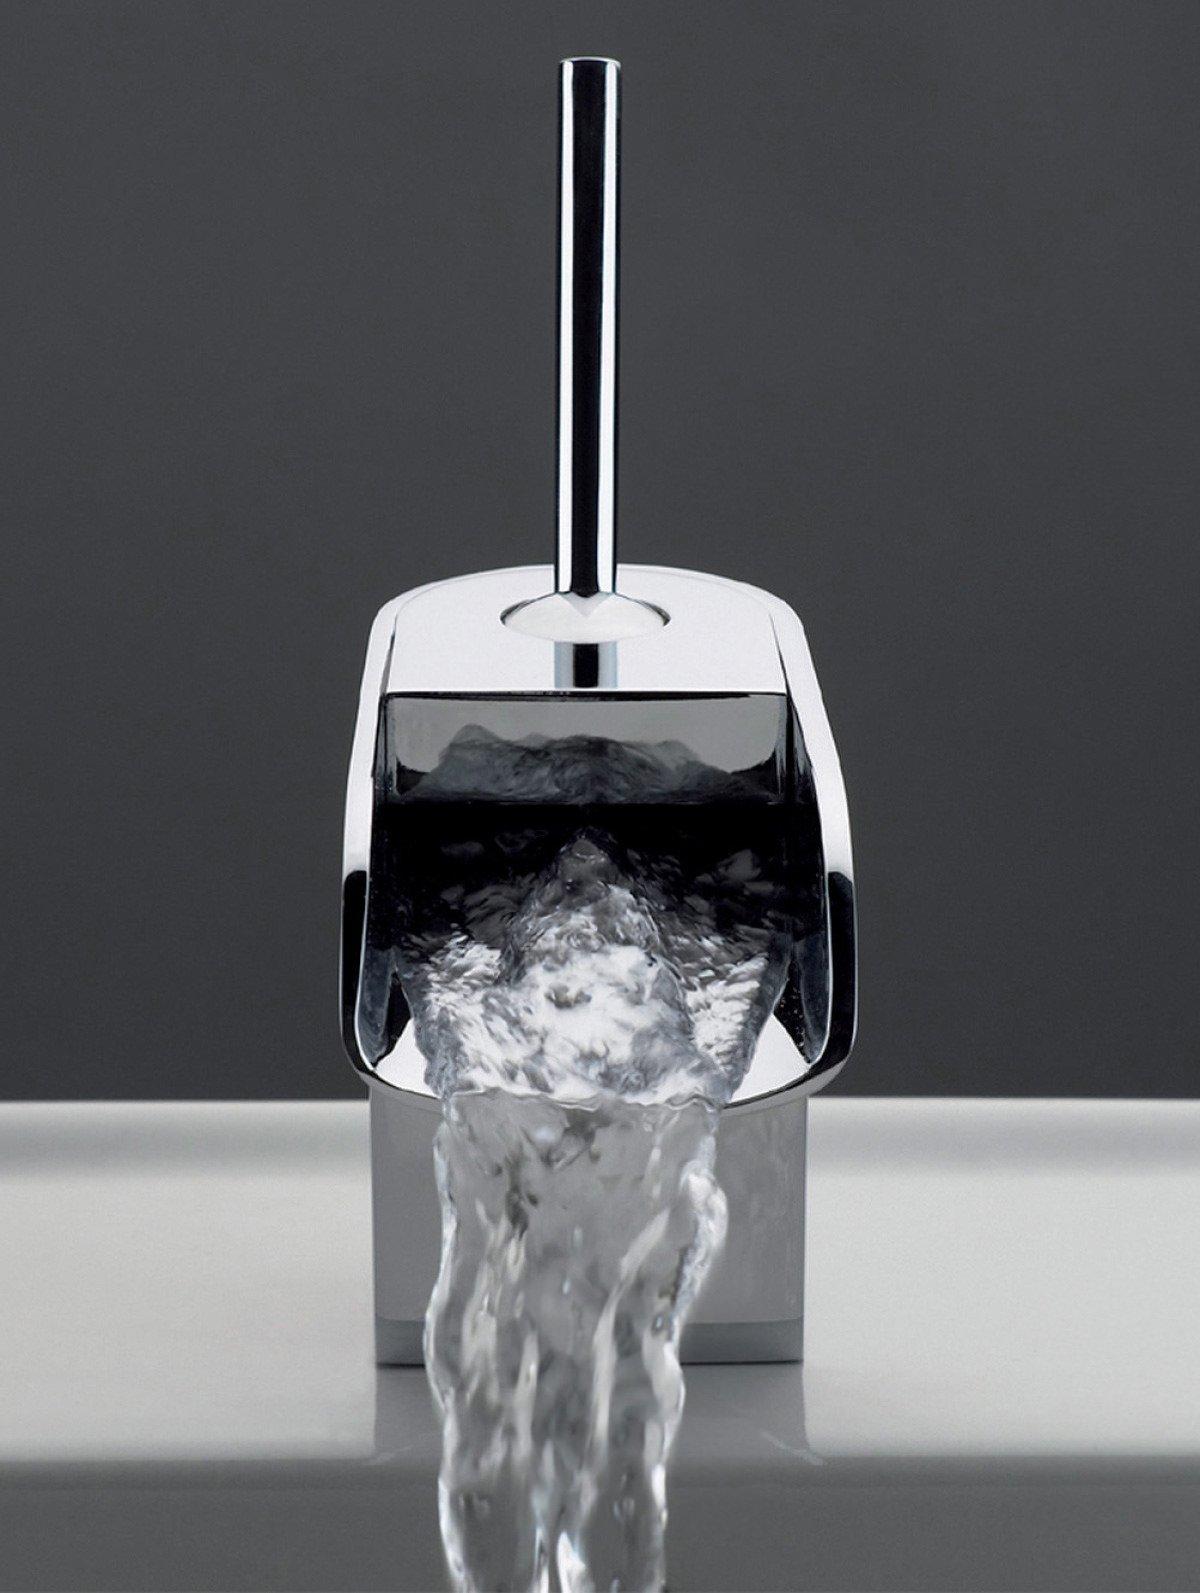 Crosswater love me single lever monobloc basin mixer tap - Grifo lavabo cascada ...